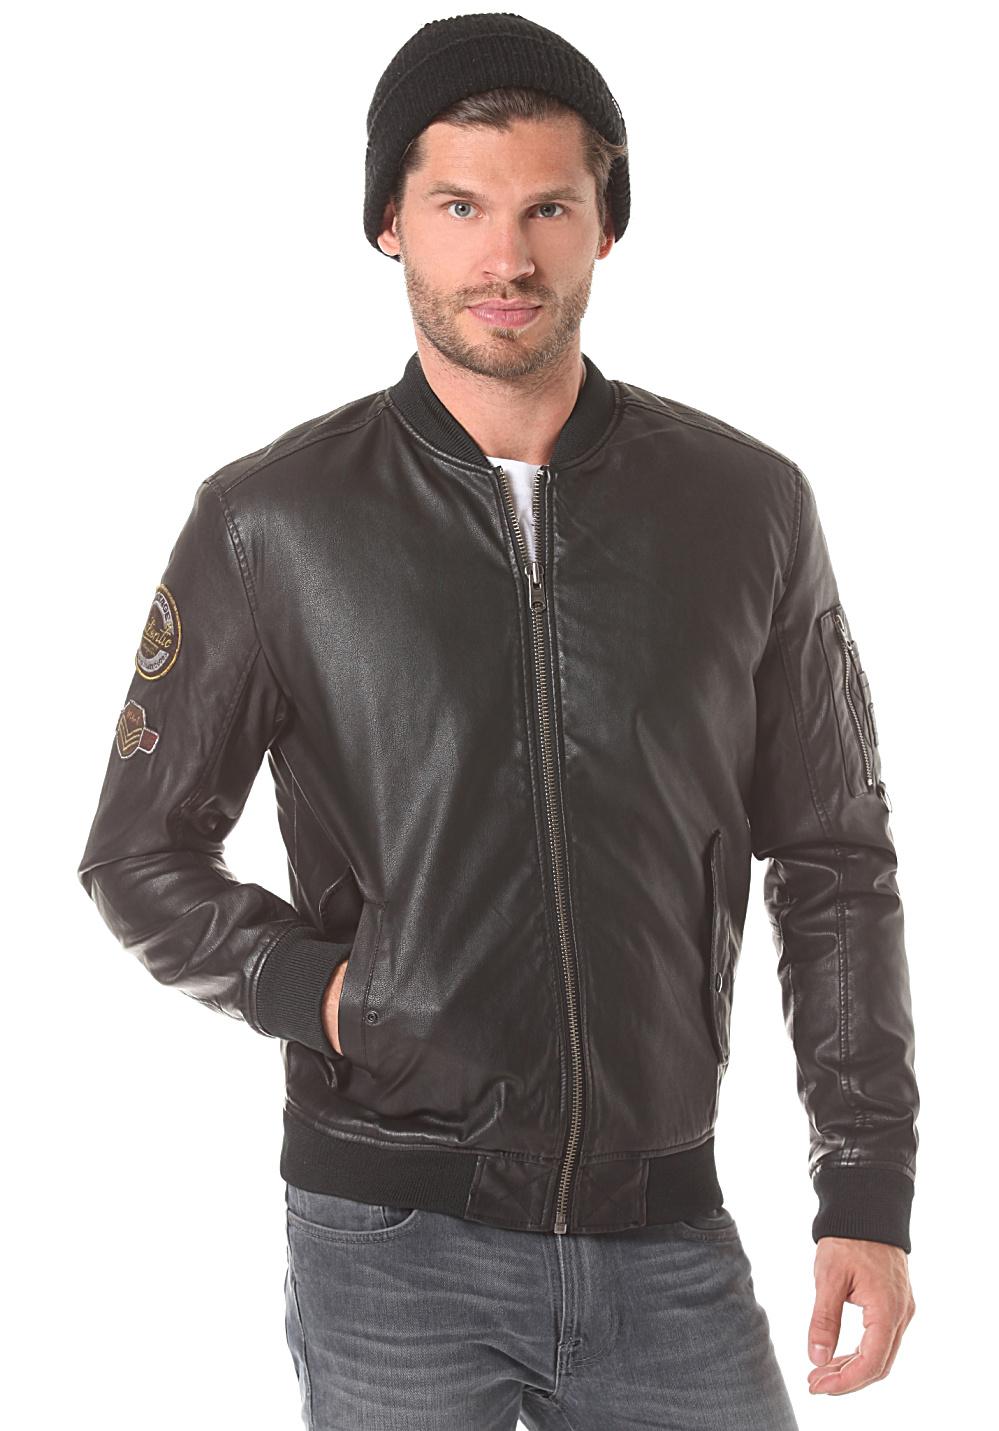 8 tendances mode homme sportswear automne hiver 2017 – 2018